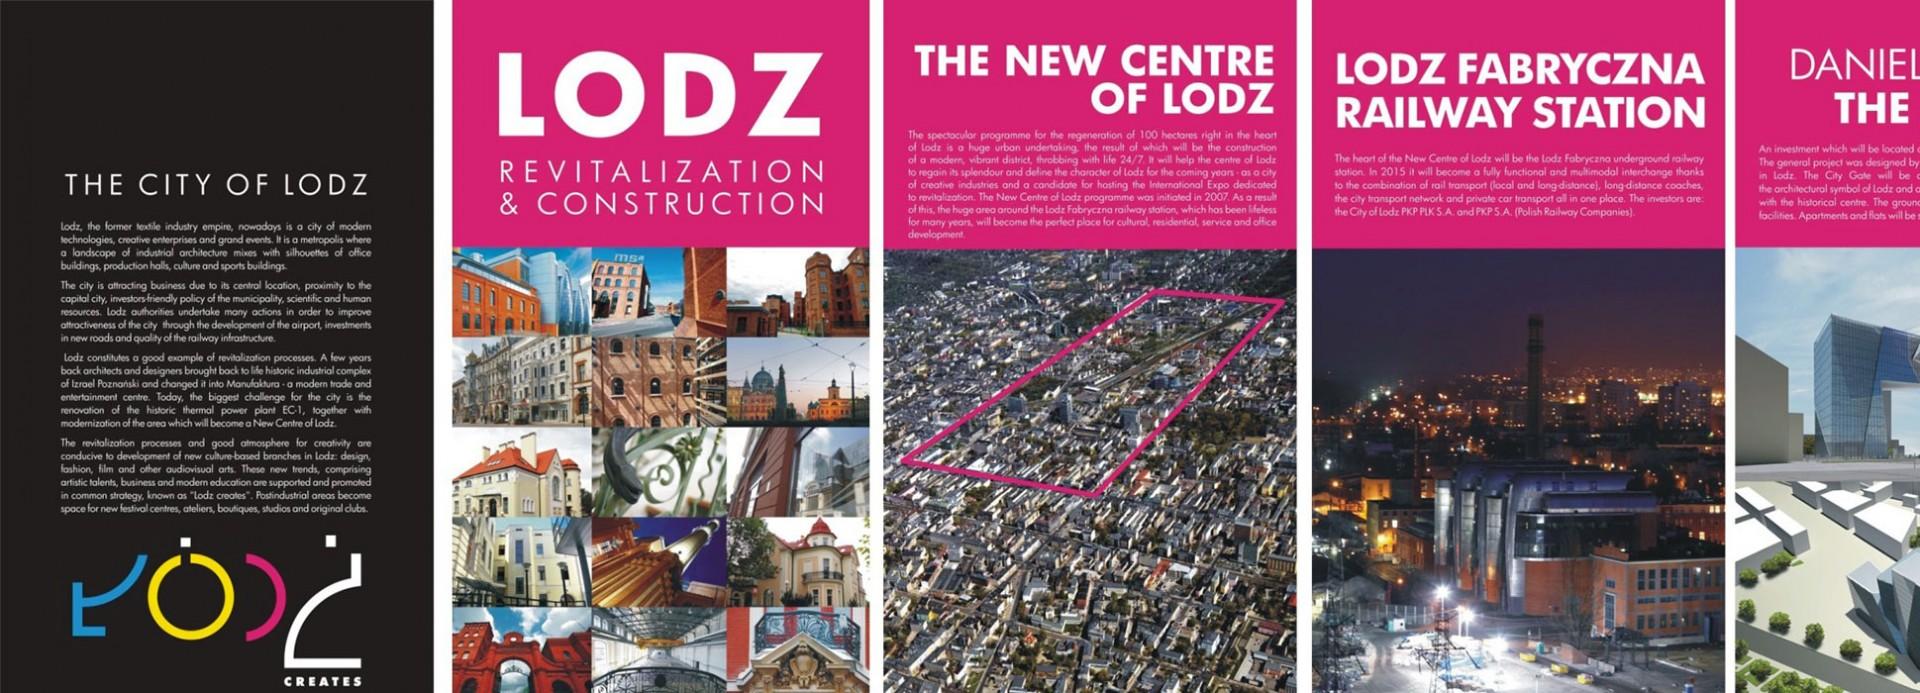 Exhibition: LODZ. Revitalization and construction